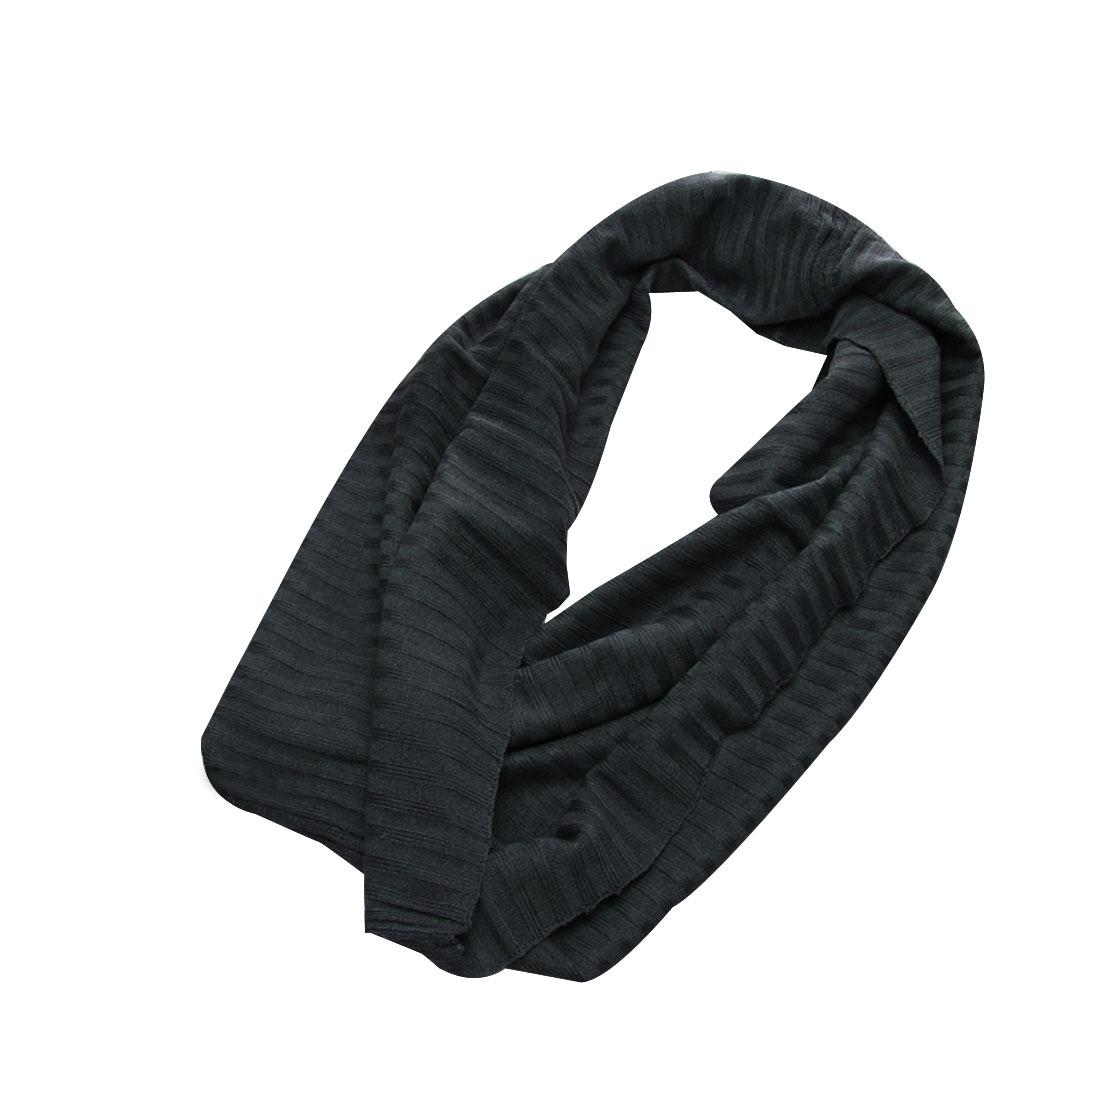 Men Dark Gray Fashion Stretchy Solid Color Simple Design Scarf Scarves